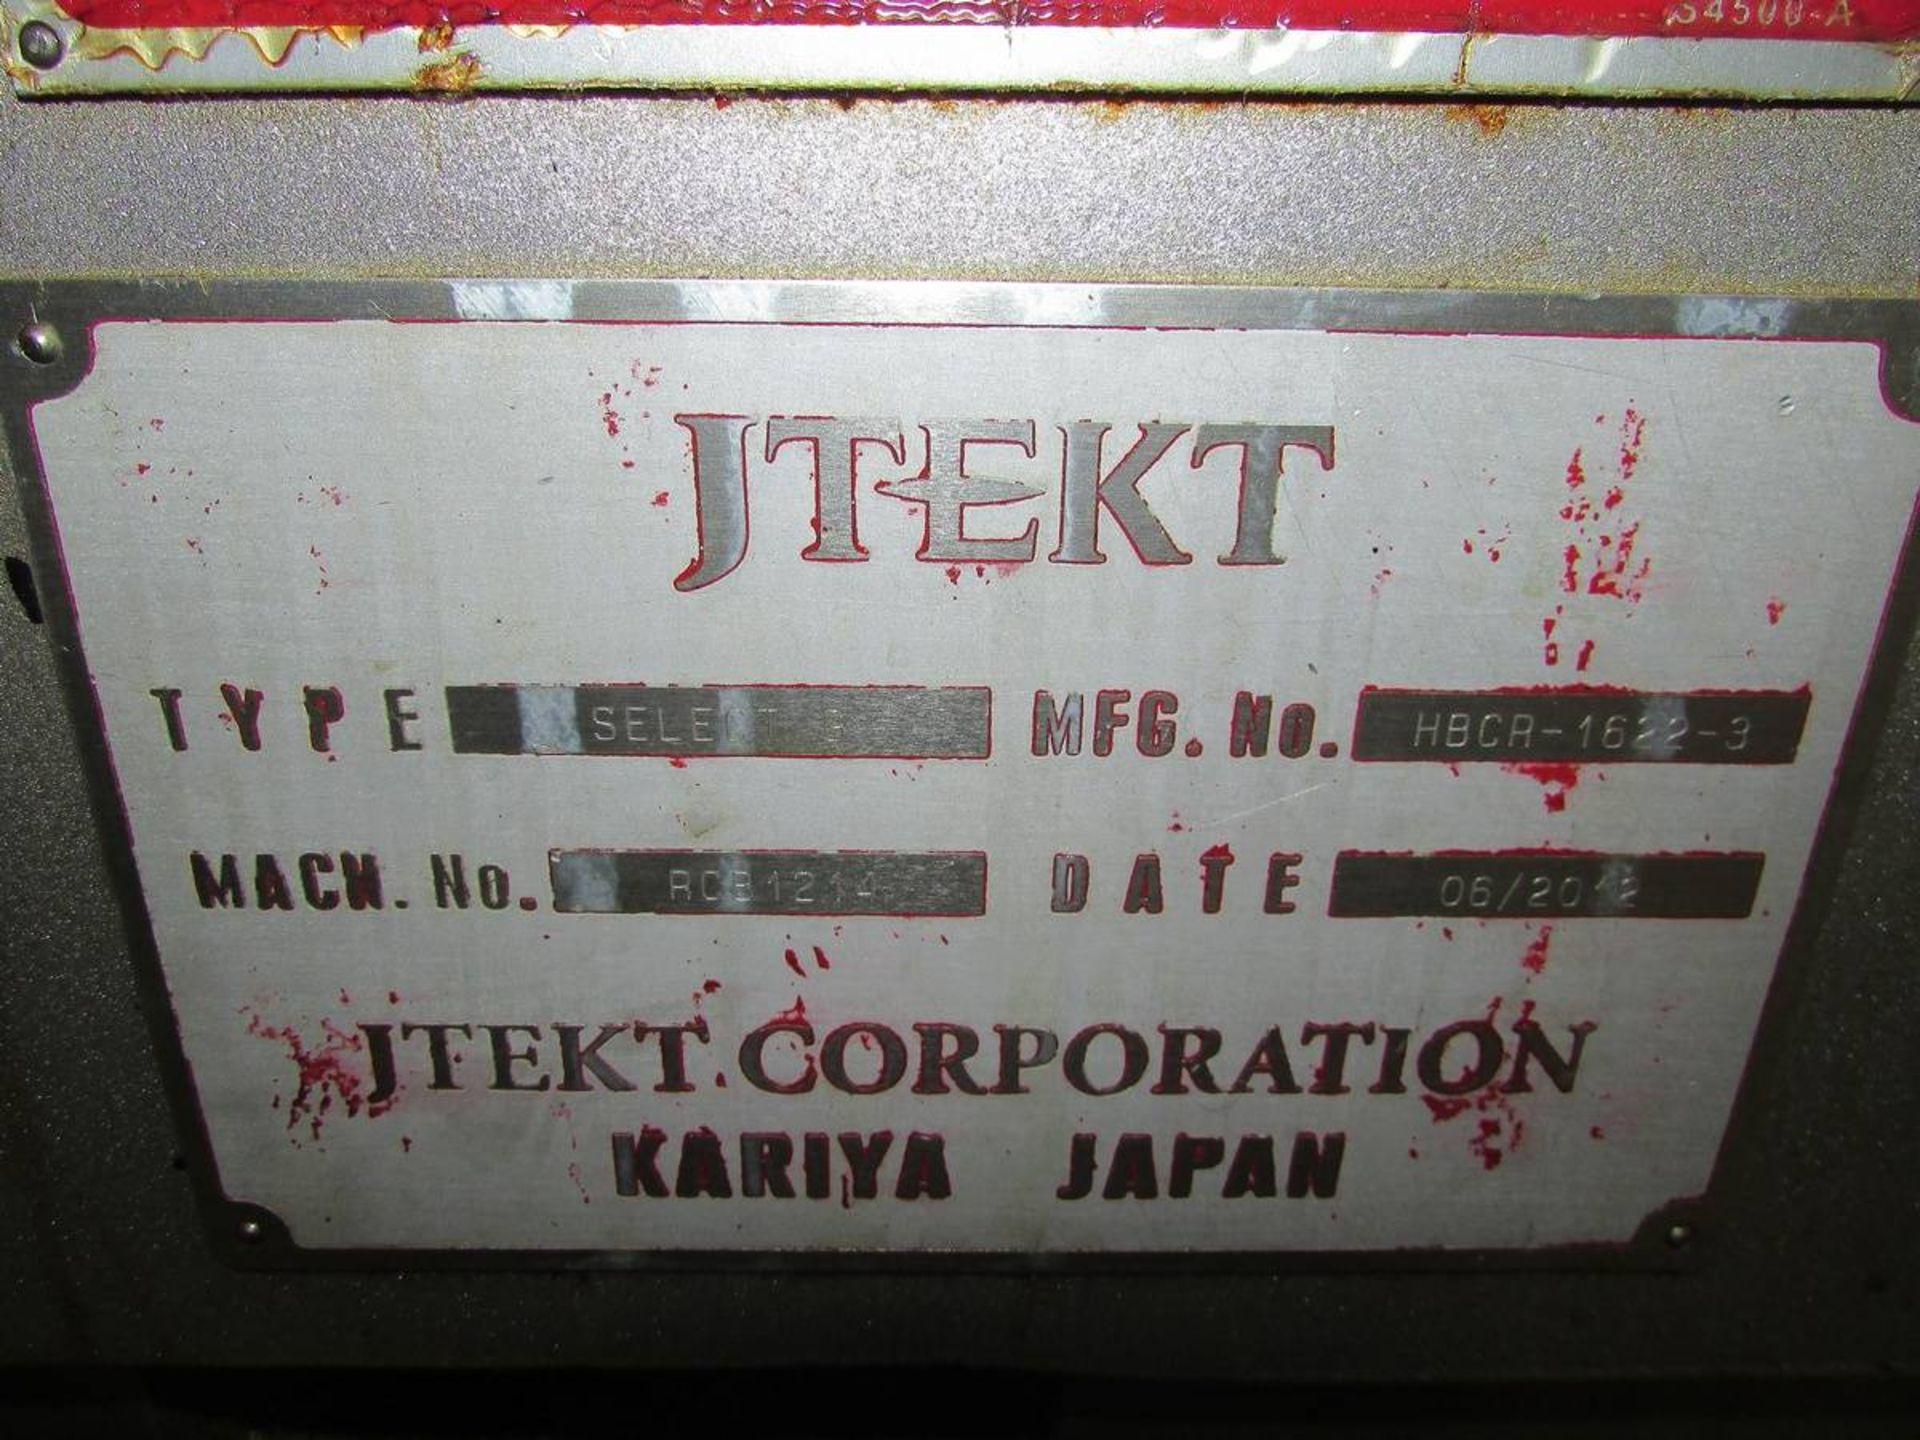 2012 Toyoda/ JTEKT 45m Select G II CNC OD Cylindrical Grinder - Image 21 of 21